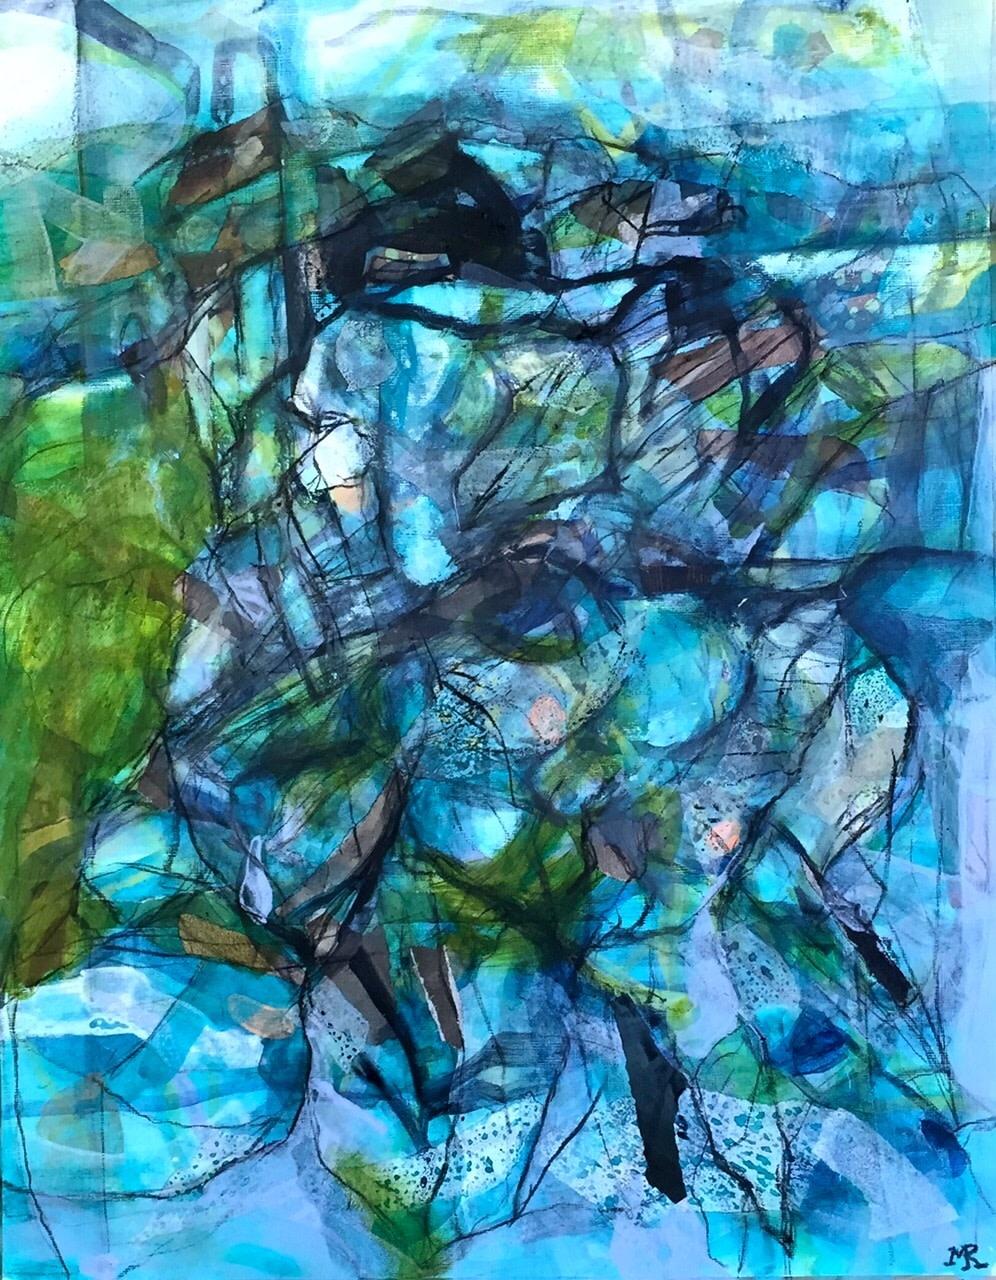 <span class=&#34;link fancybox-details-link&#34;><a href=&#34;/exhibitions/24/works/artworks_standalone10788/&#34;>View Detail Page</a></span><div class=&#34;artist&#34;><span class=&#34;artist&#34;><strong>Mark Raggett</strong></span></div><div class=&#34;title&#34;><em>Pembrokeshire Headland</em></div><div class=&#34;medium&#34;>mixed media</div><div class=&#34;dimensions&#34;>70x60cm</div>